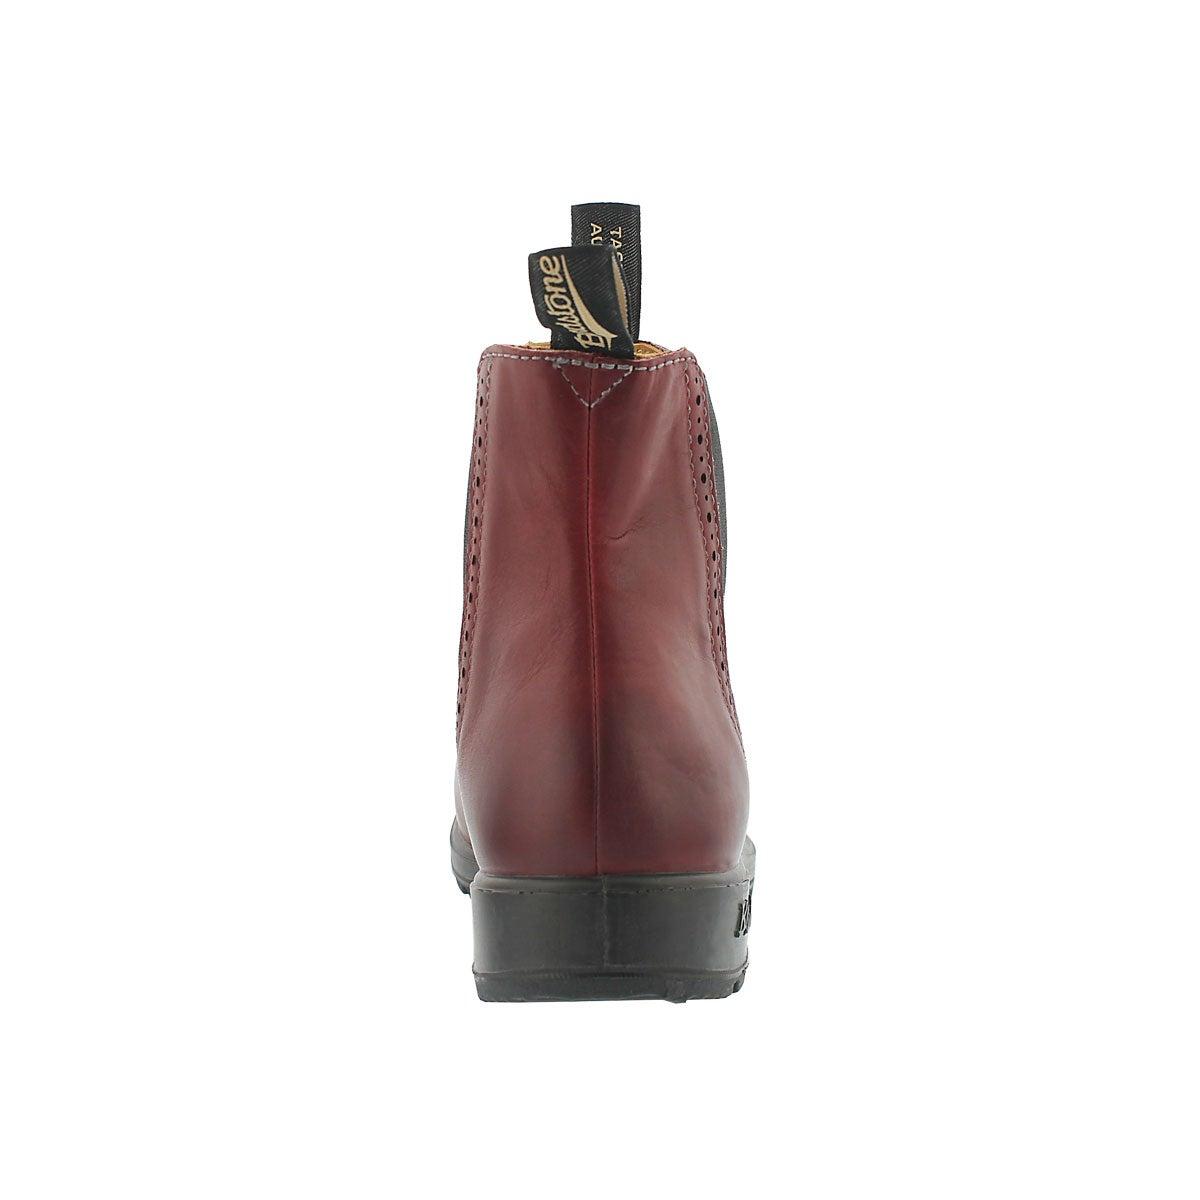 Lds Girlfriend burgundy pull on boot